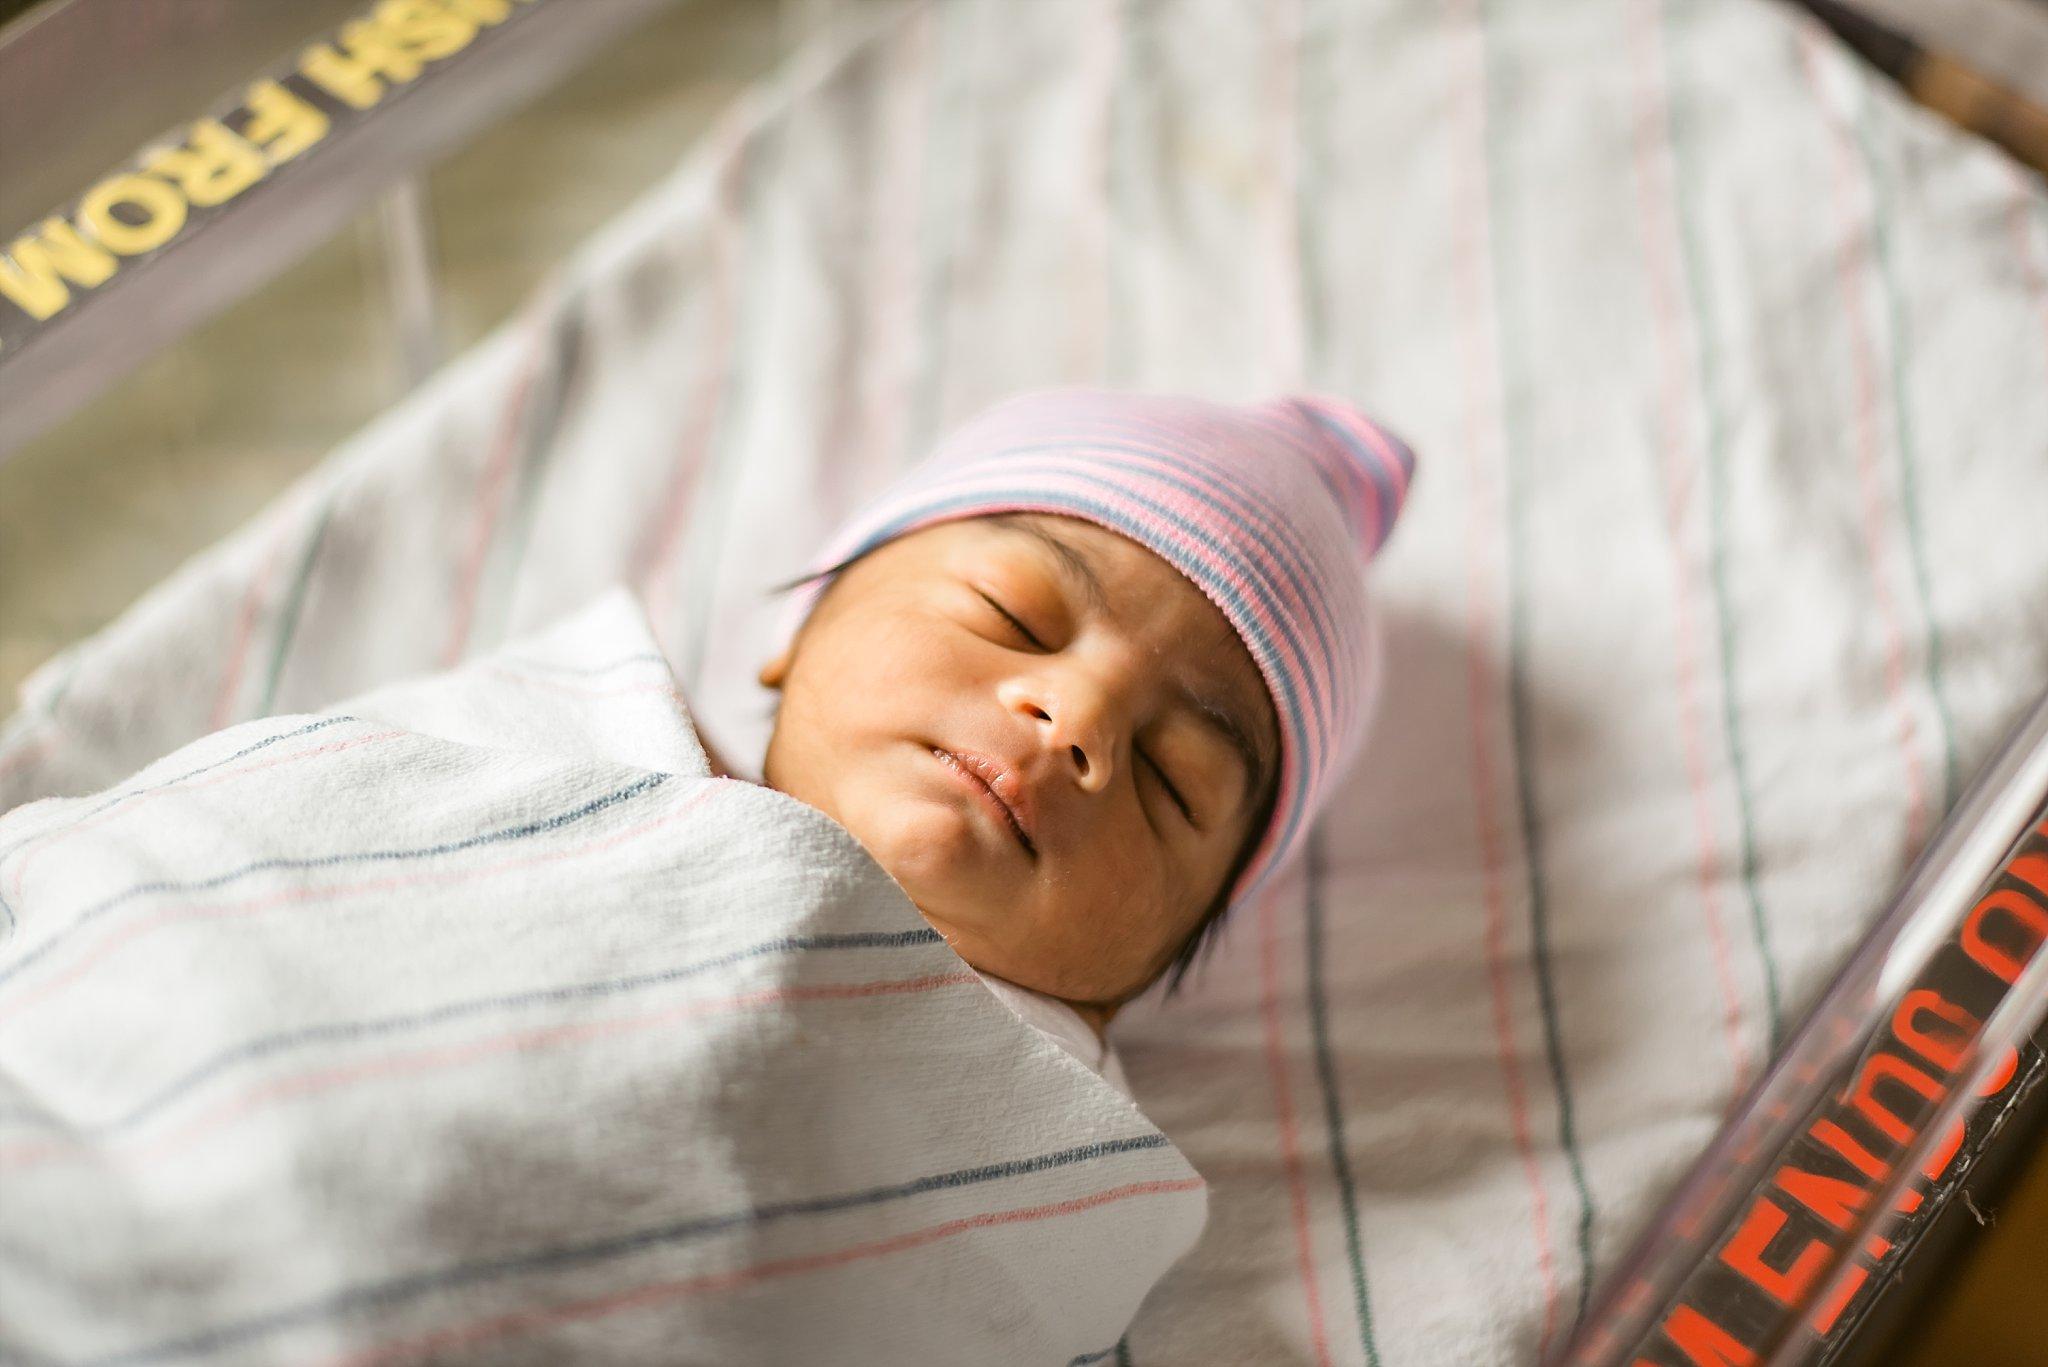 Newborn baby boy with hospital hat on